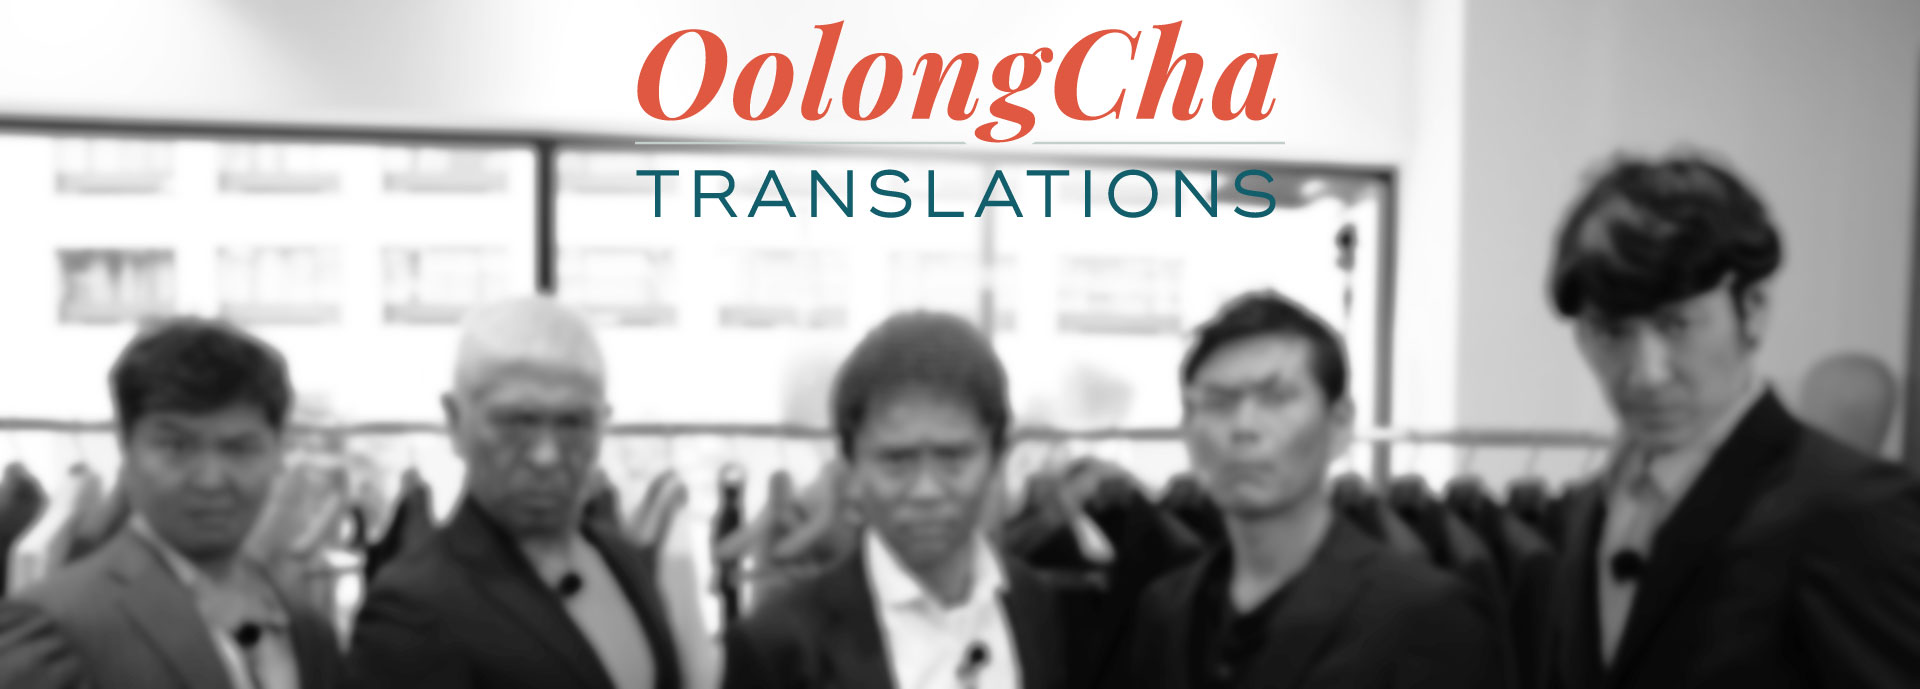 OolongCha Translations